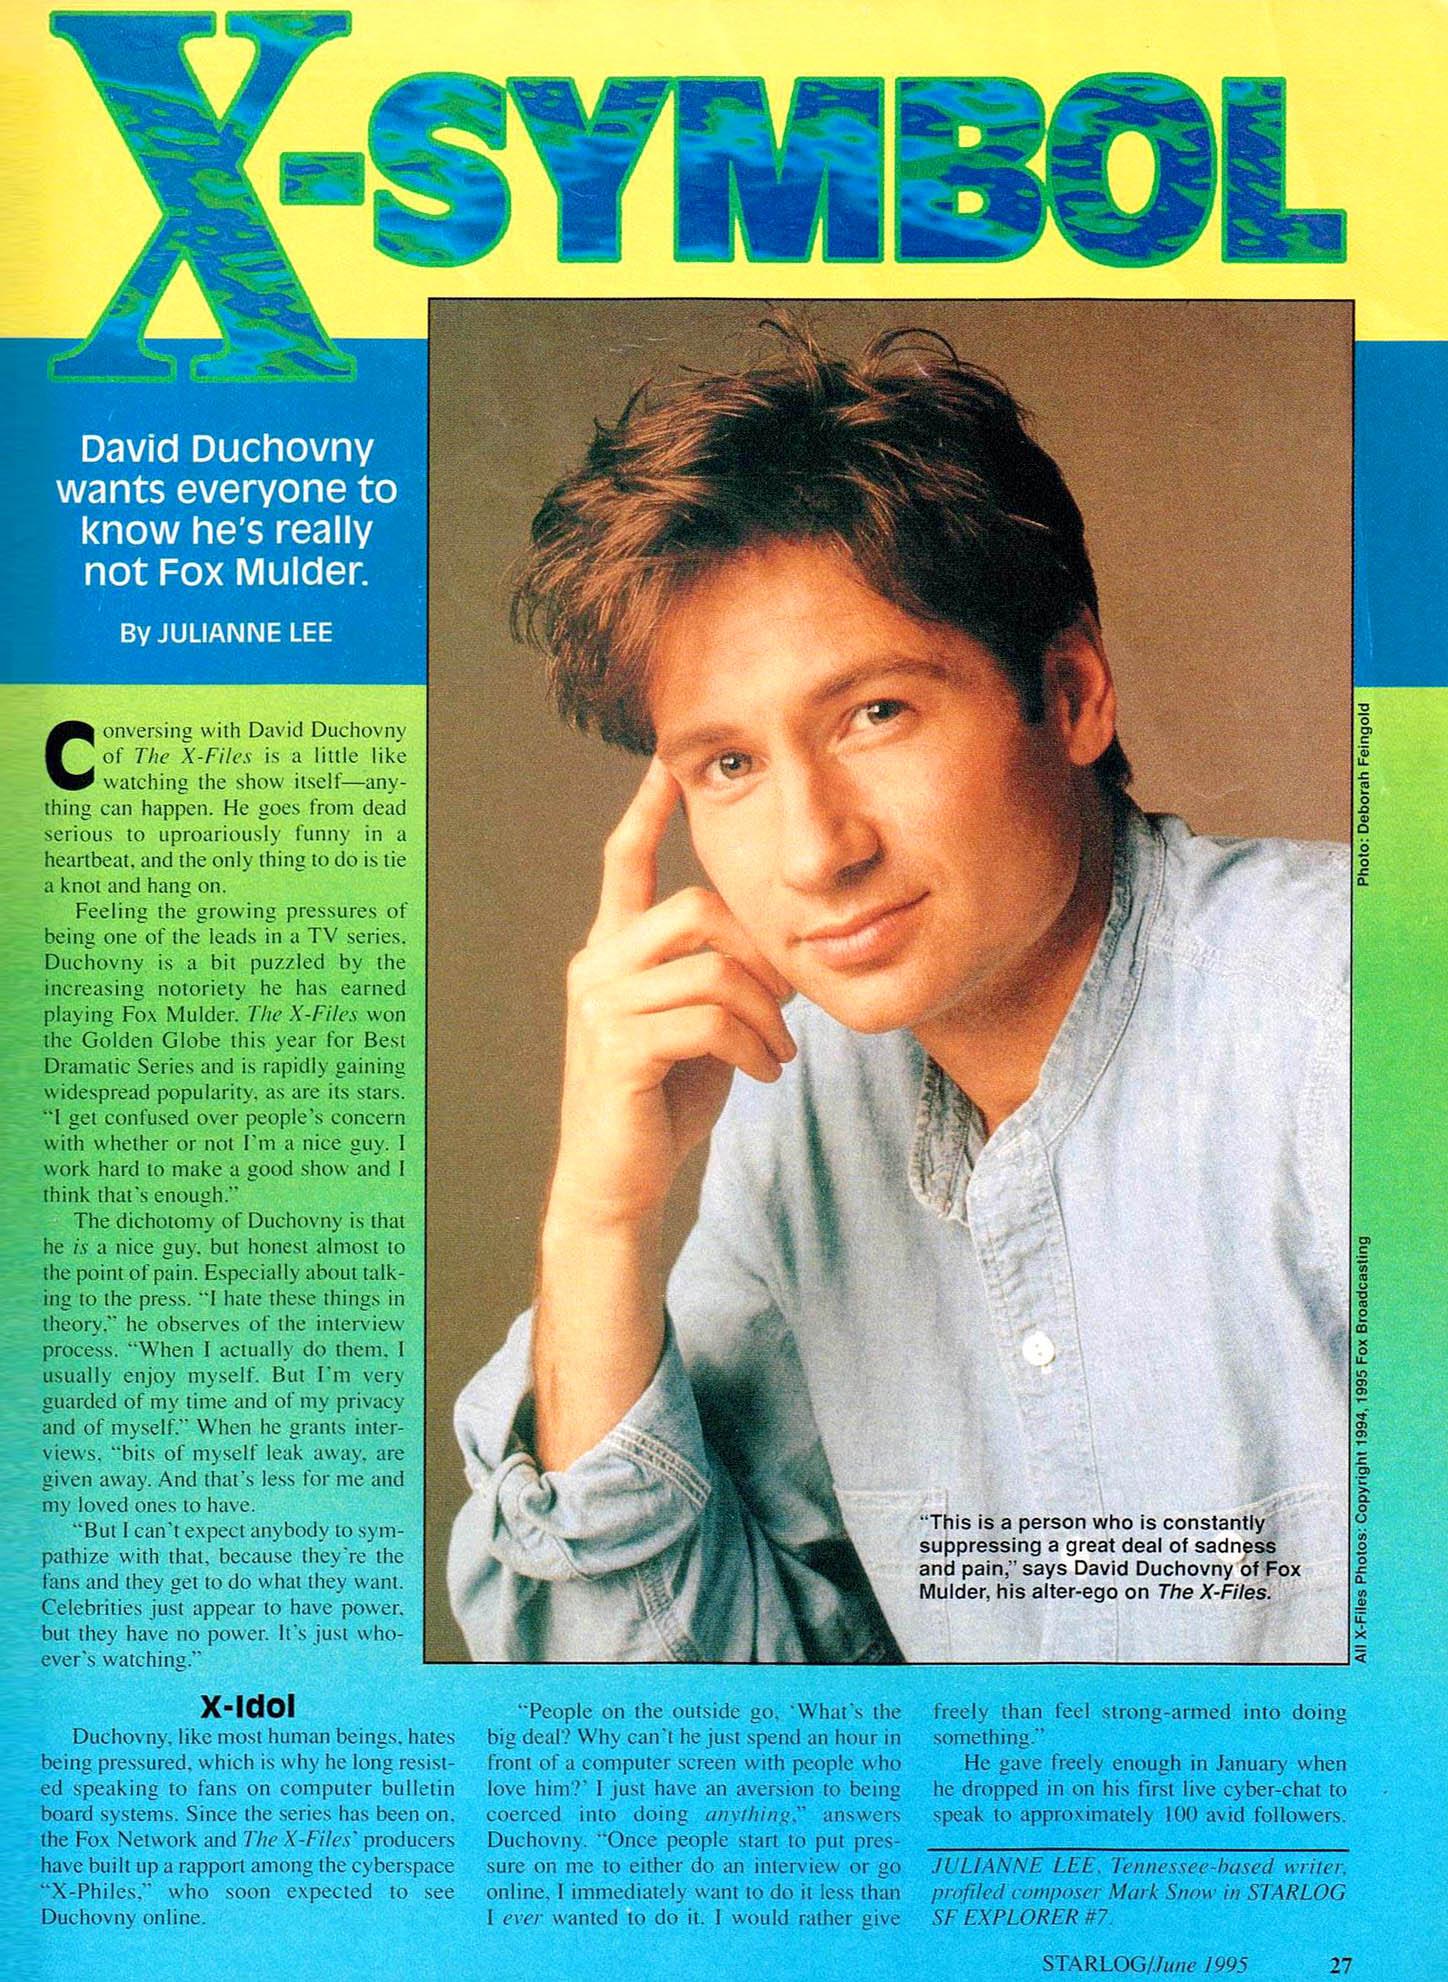 Starlog 215 1995 06 X-Files-1.jpg